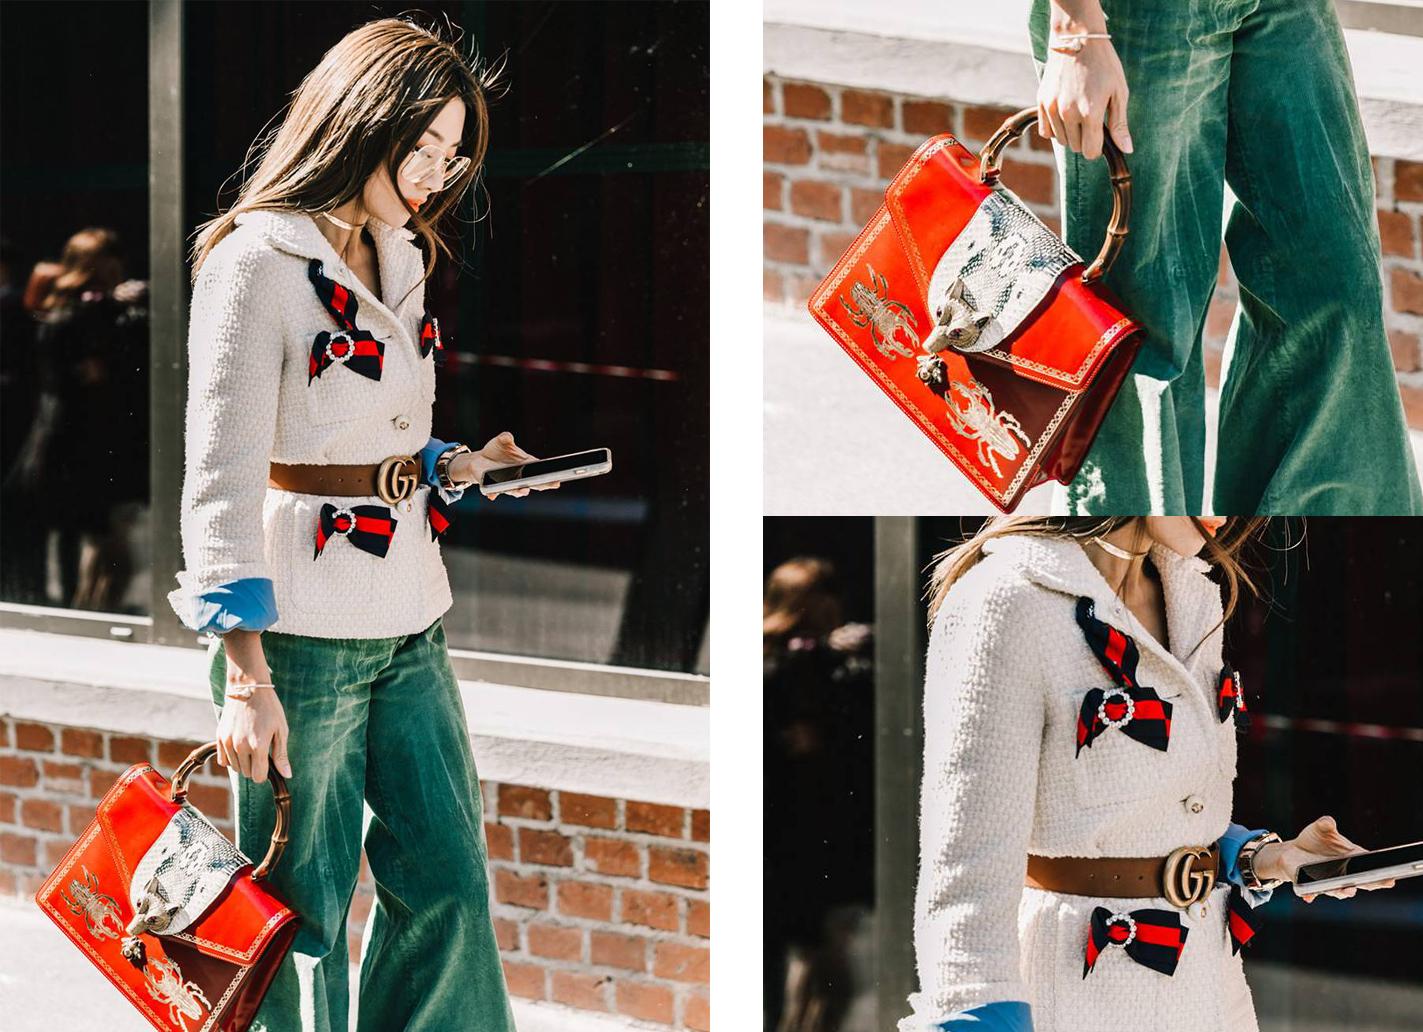 creative-ways-to-wear-a-gucci-belt-italist-magazine-05